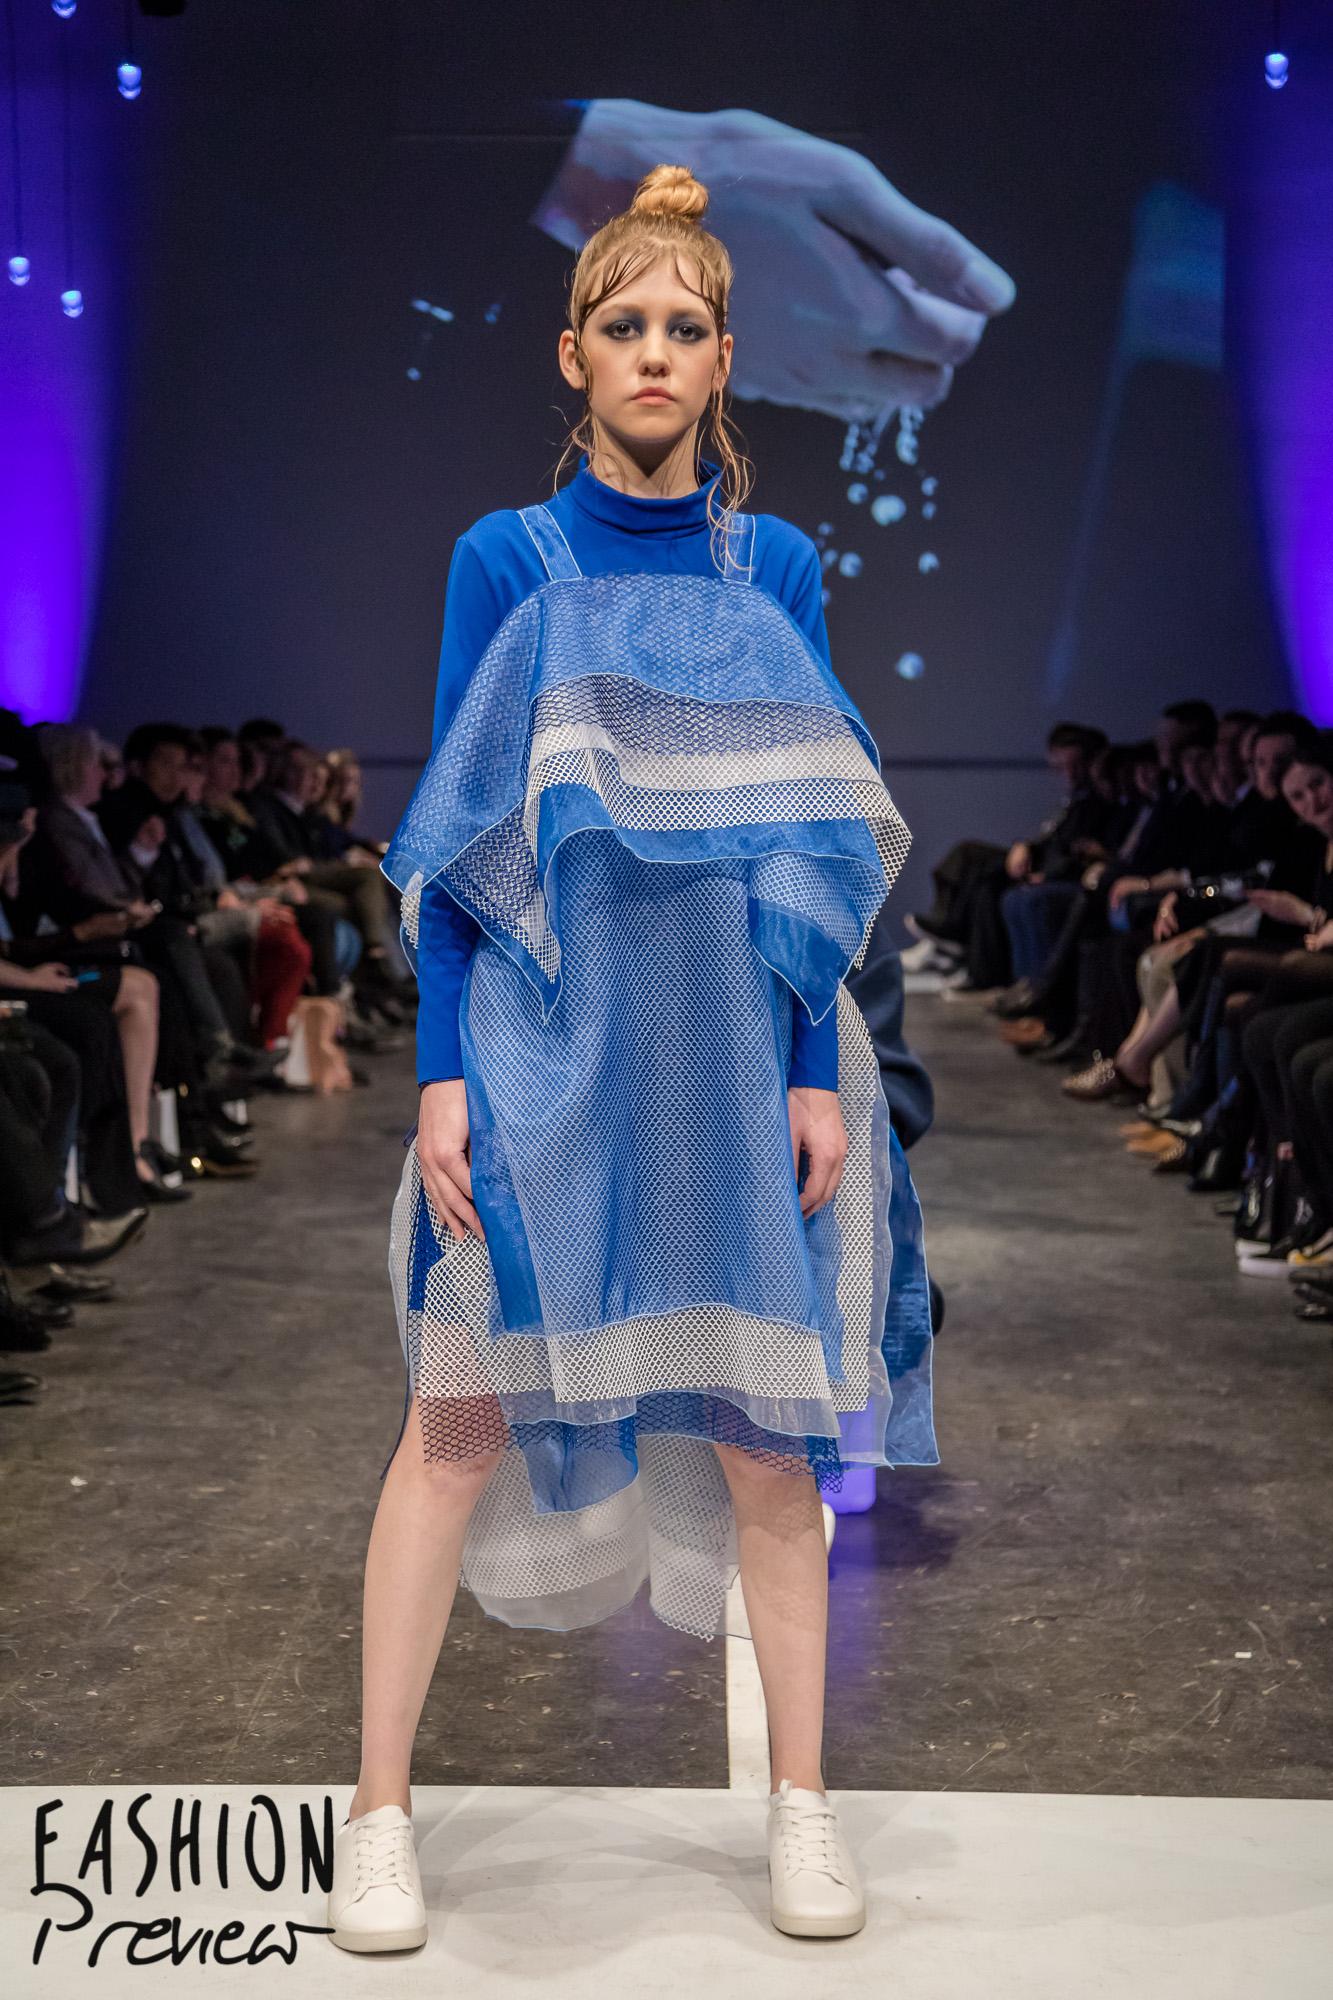 Fashion Preview 9 - Cegep Marie Victorin-13.jpg